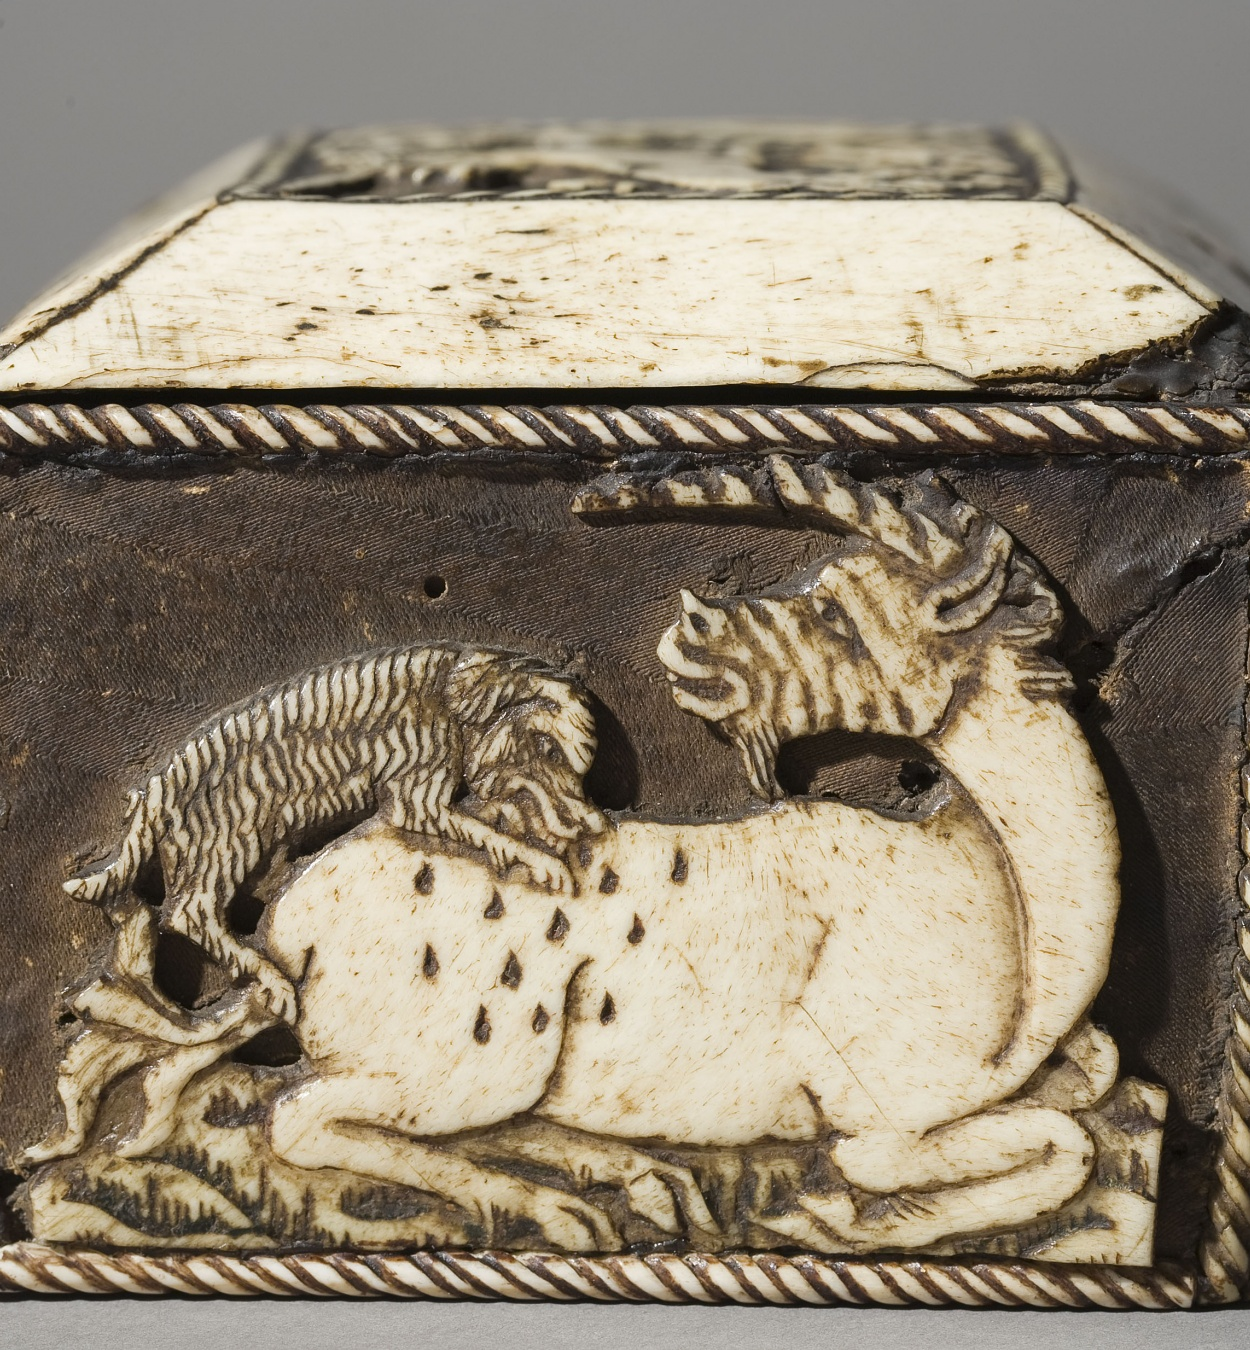 Anònim. França - Capseta amatòria amb dama i unicorn - Segle XV [3]